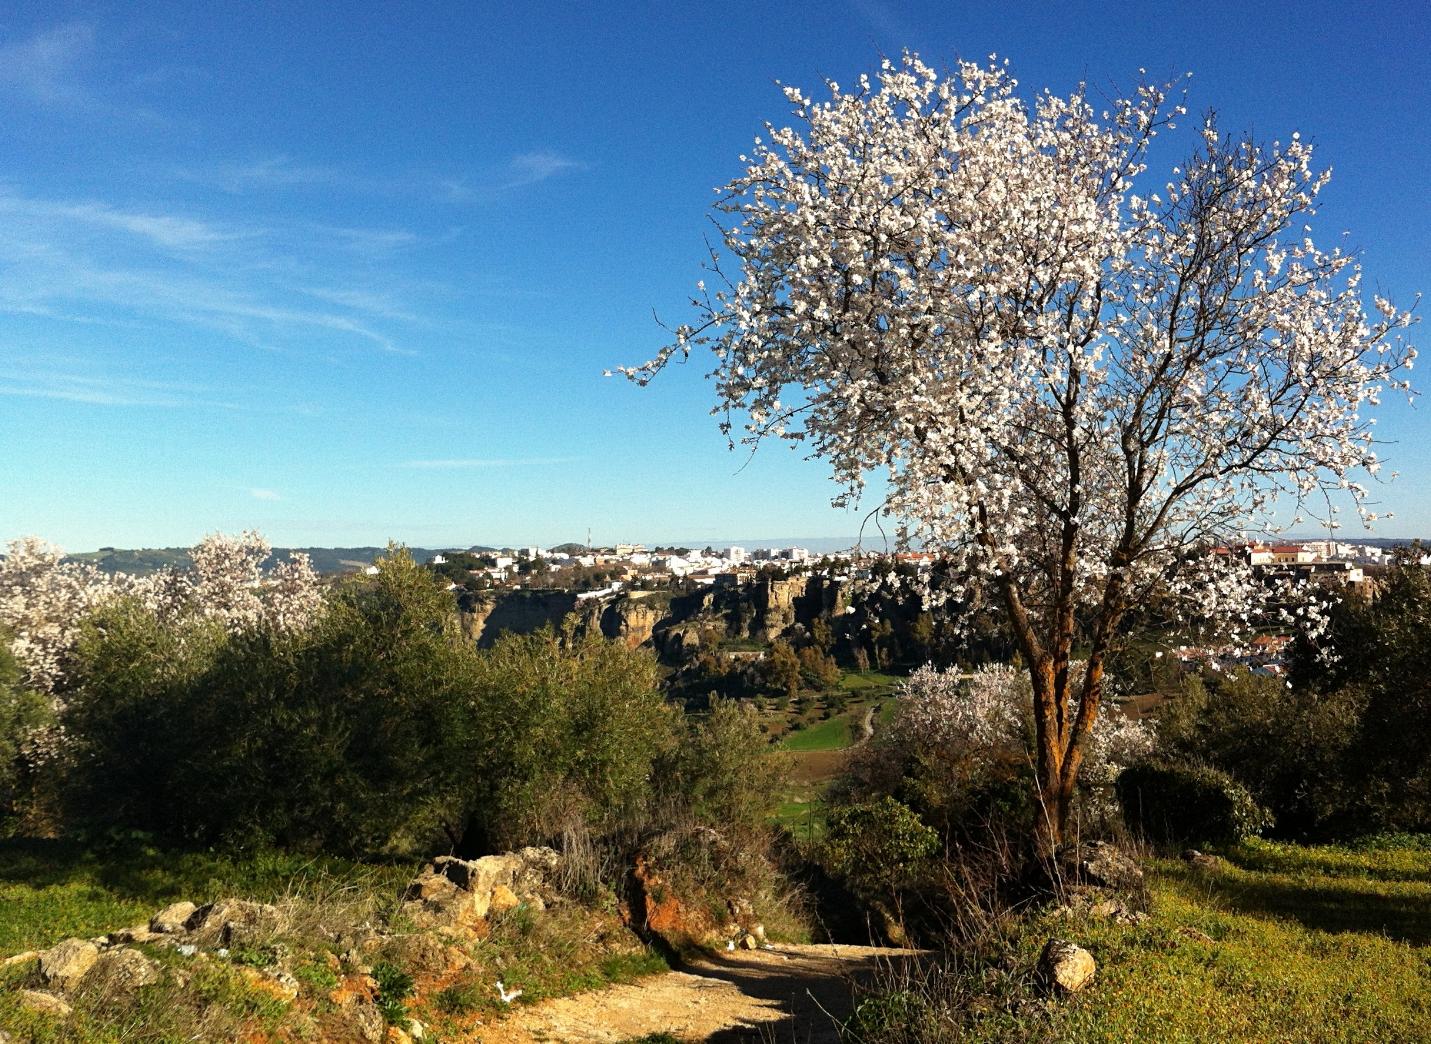 almond_blossom_spring_luxury_villa_rental_ronda_andalusia_spain